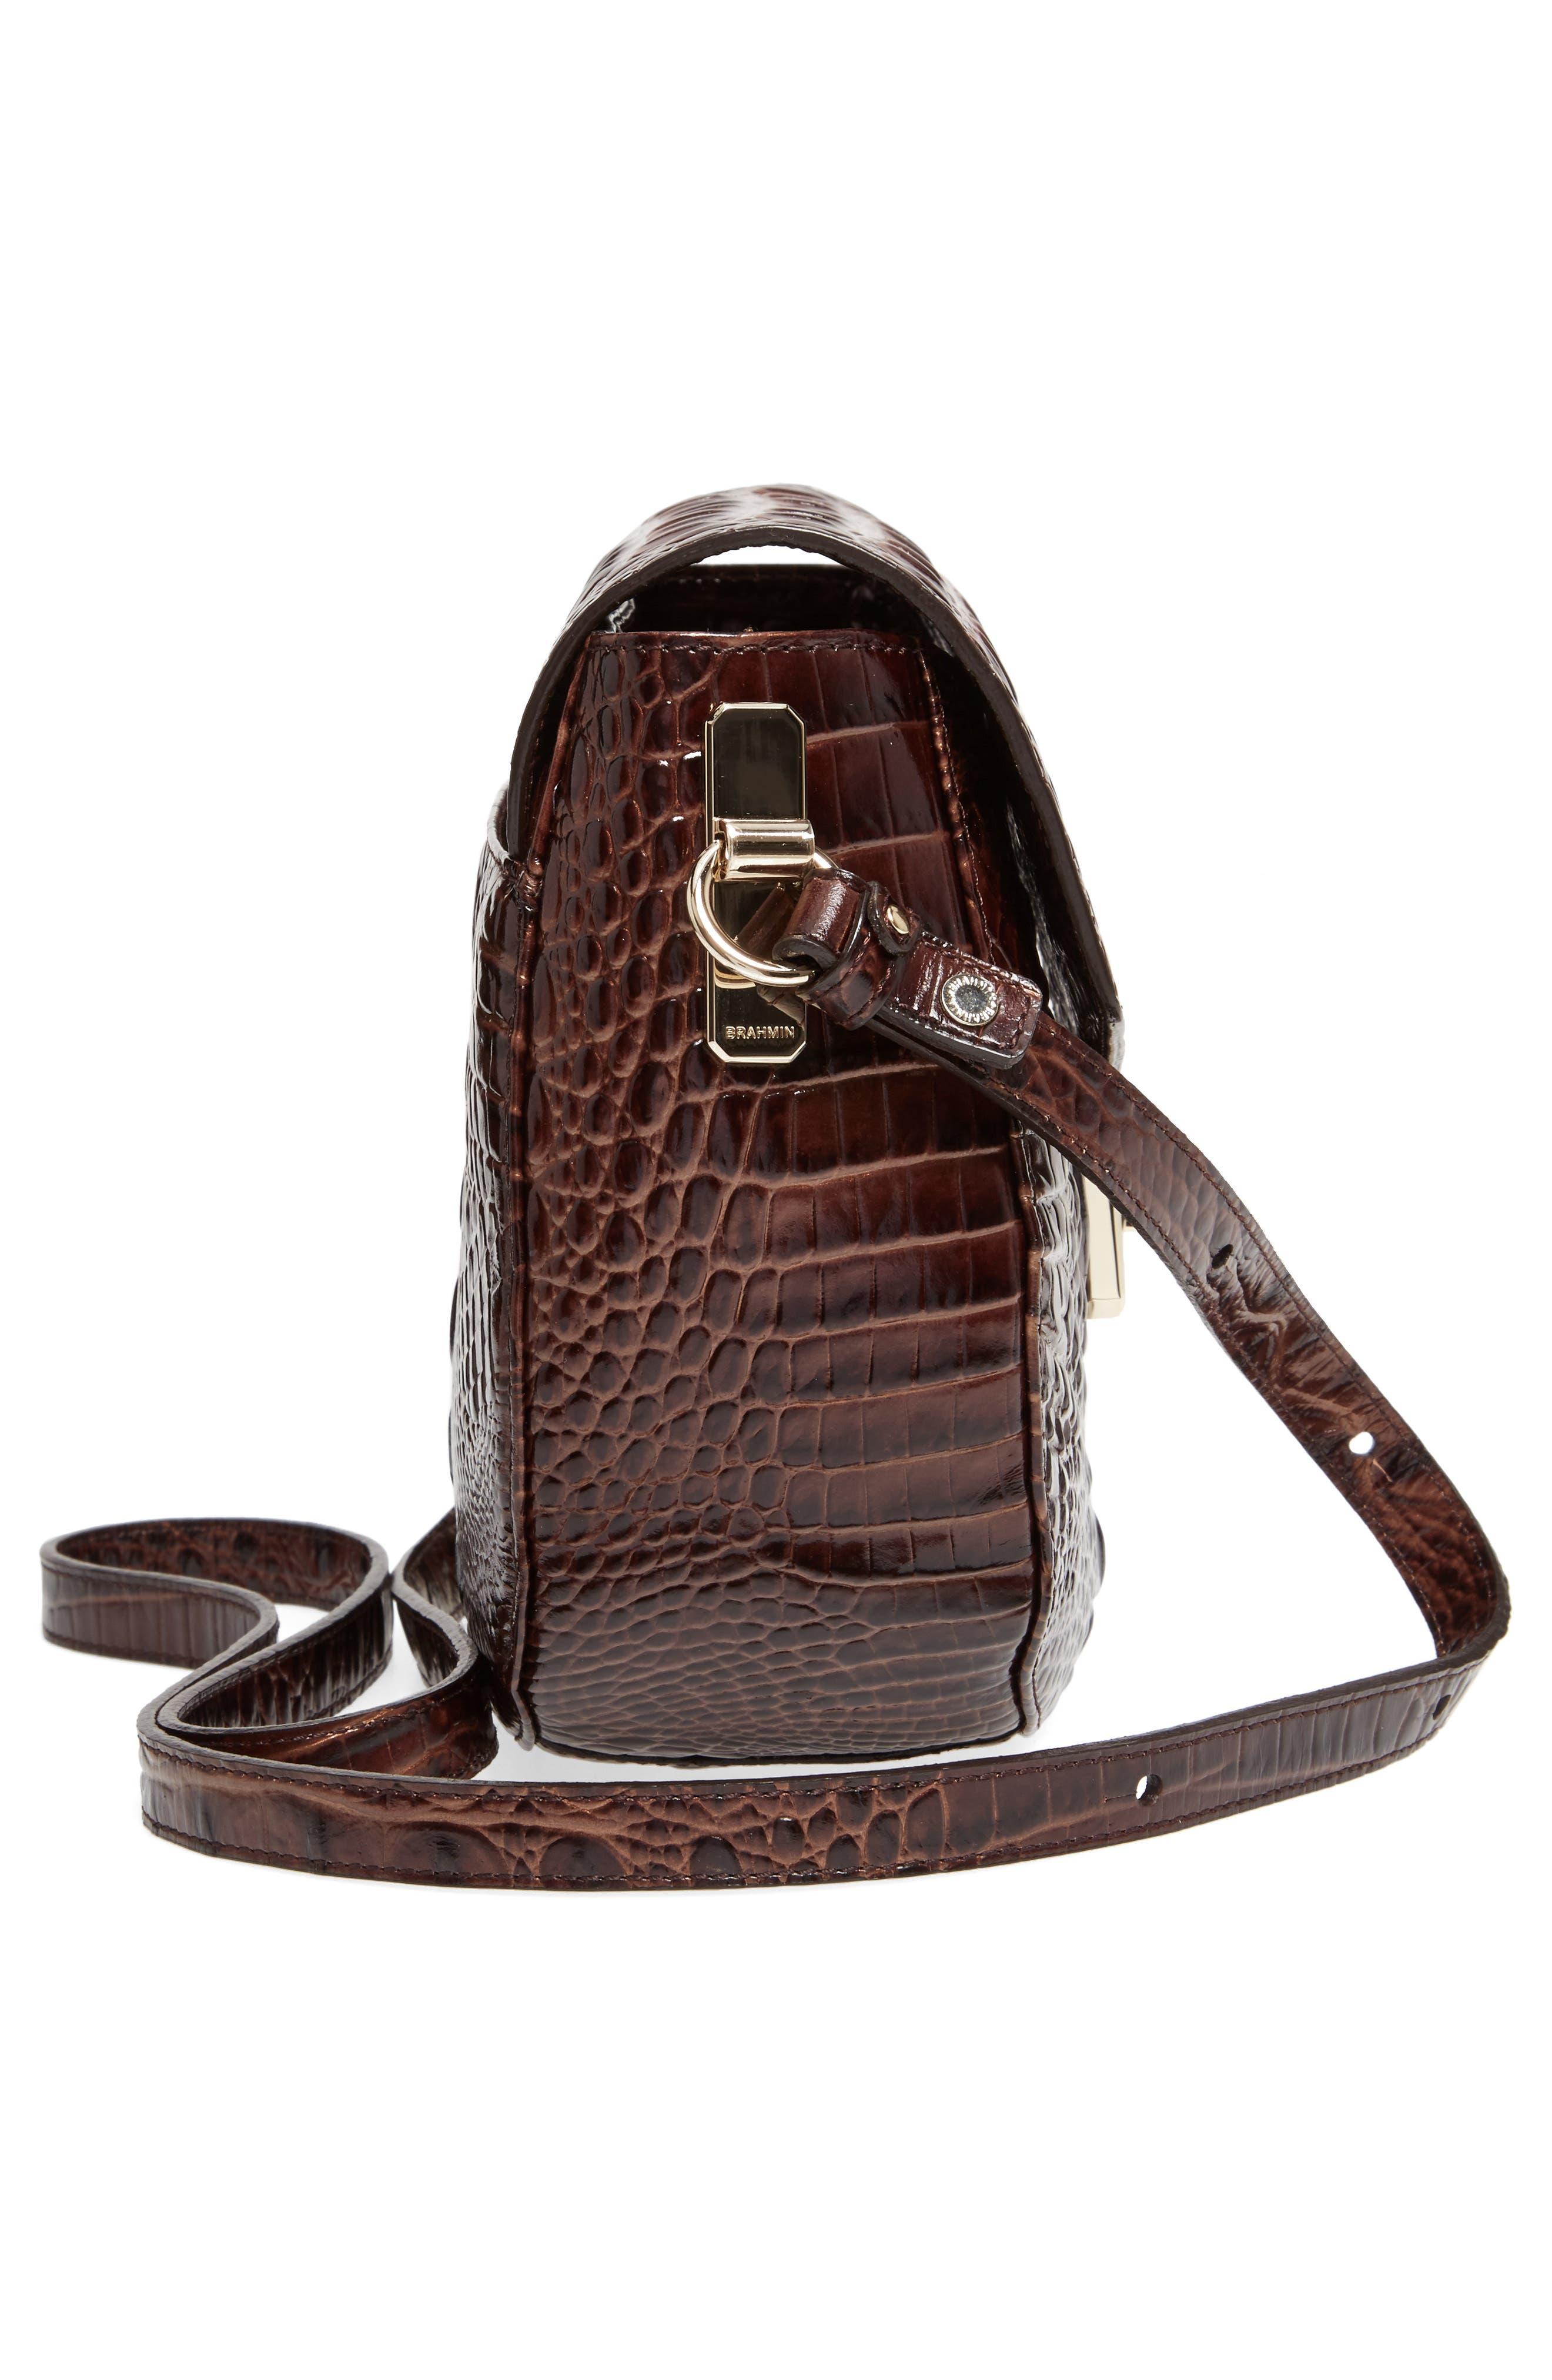 Melbourne - Lizzie Leather Crossbody Bag,                             Alternate thumbnail 23, color,